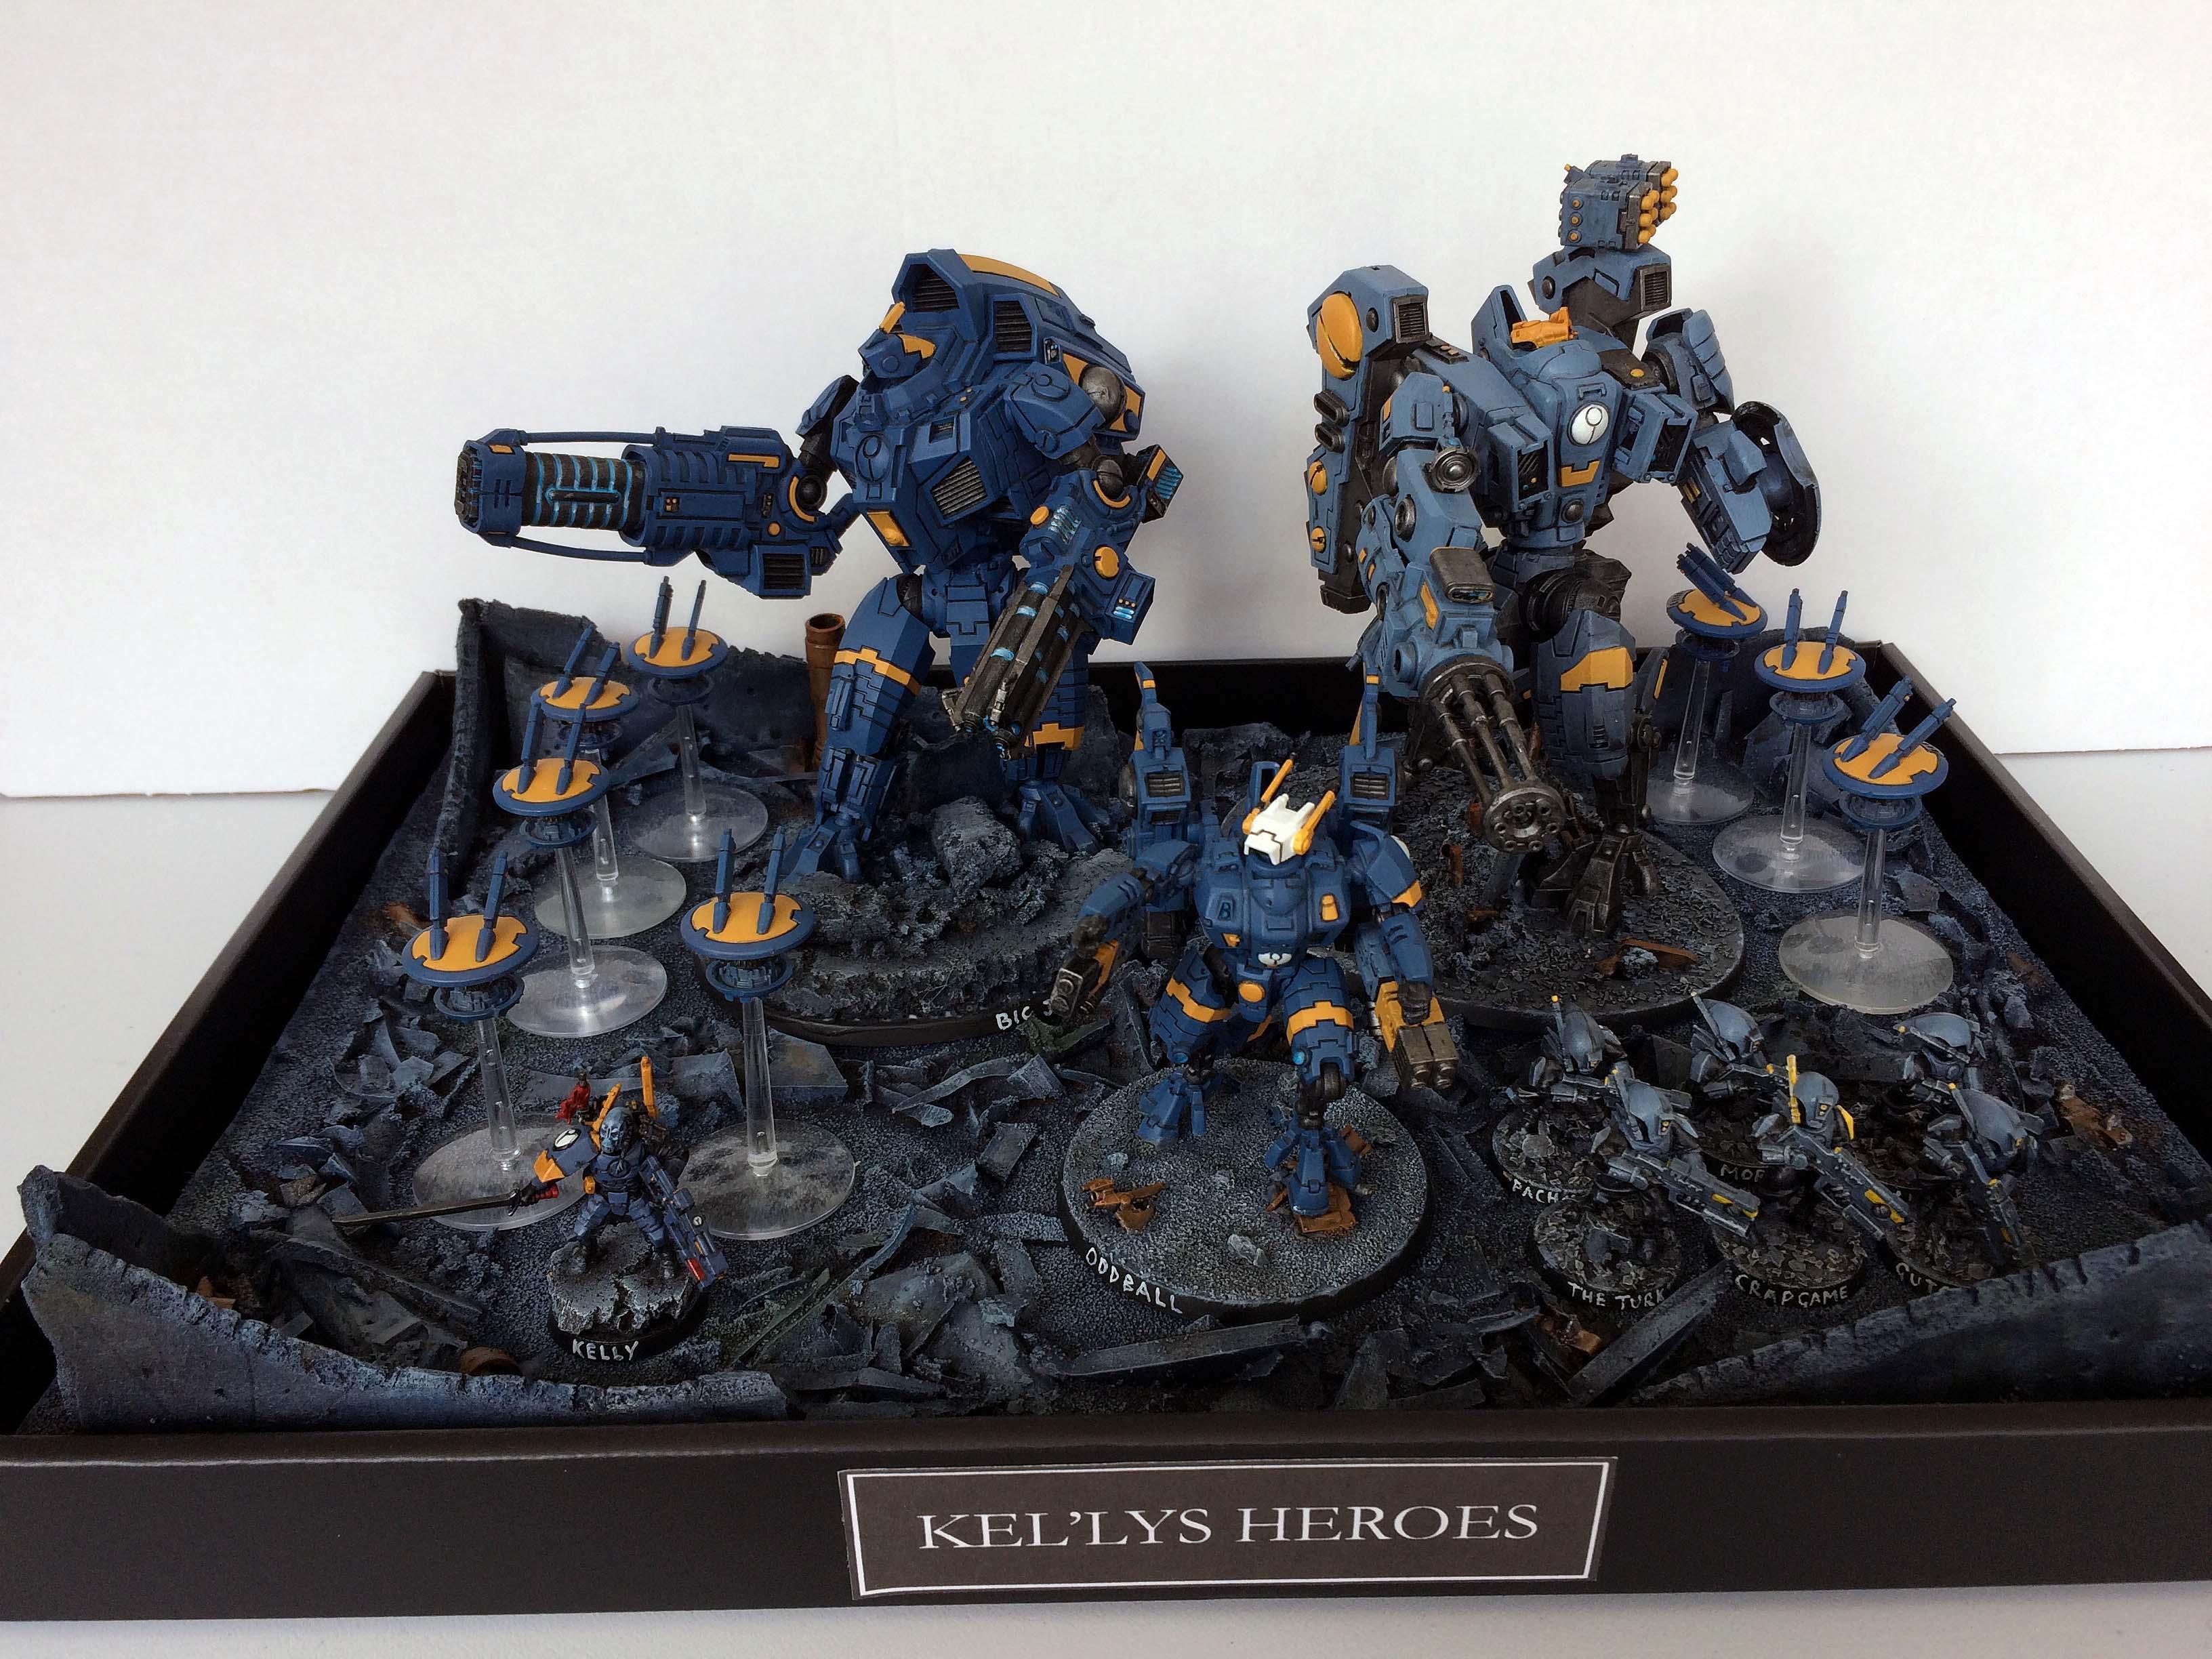 Battlesuit, Coldstar Commander, Riptide, T'au, Tau, Y'vahra